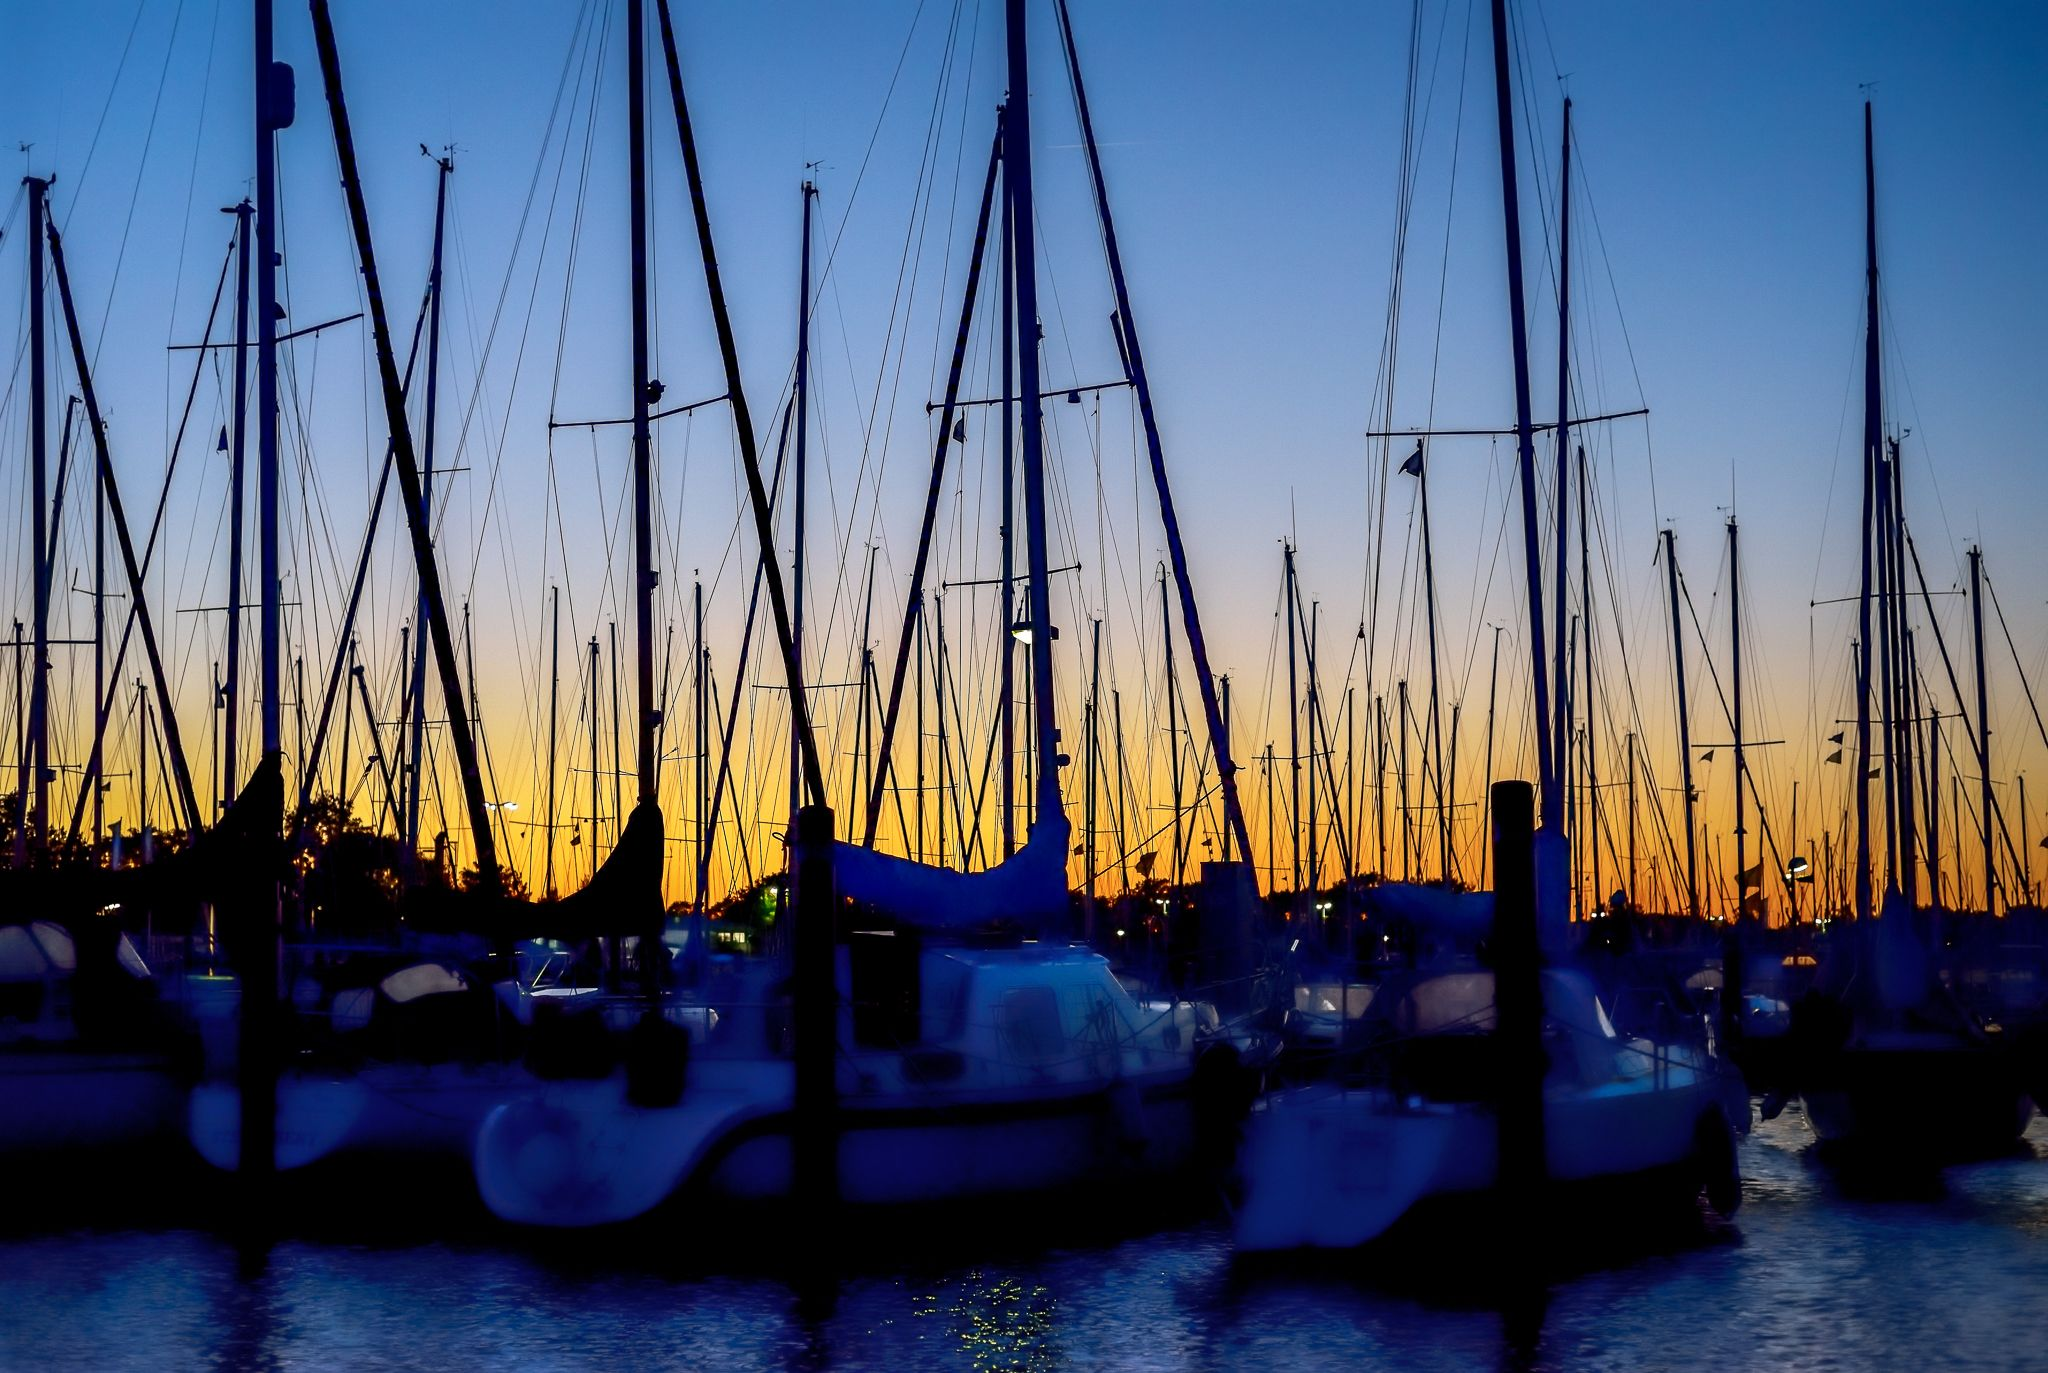 sunset at the port by Robert Glöckner